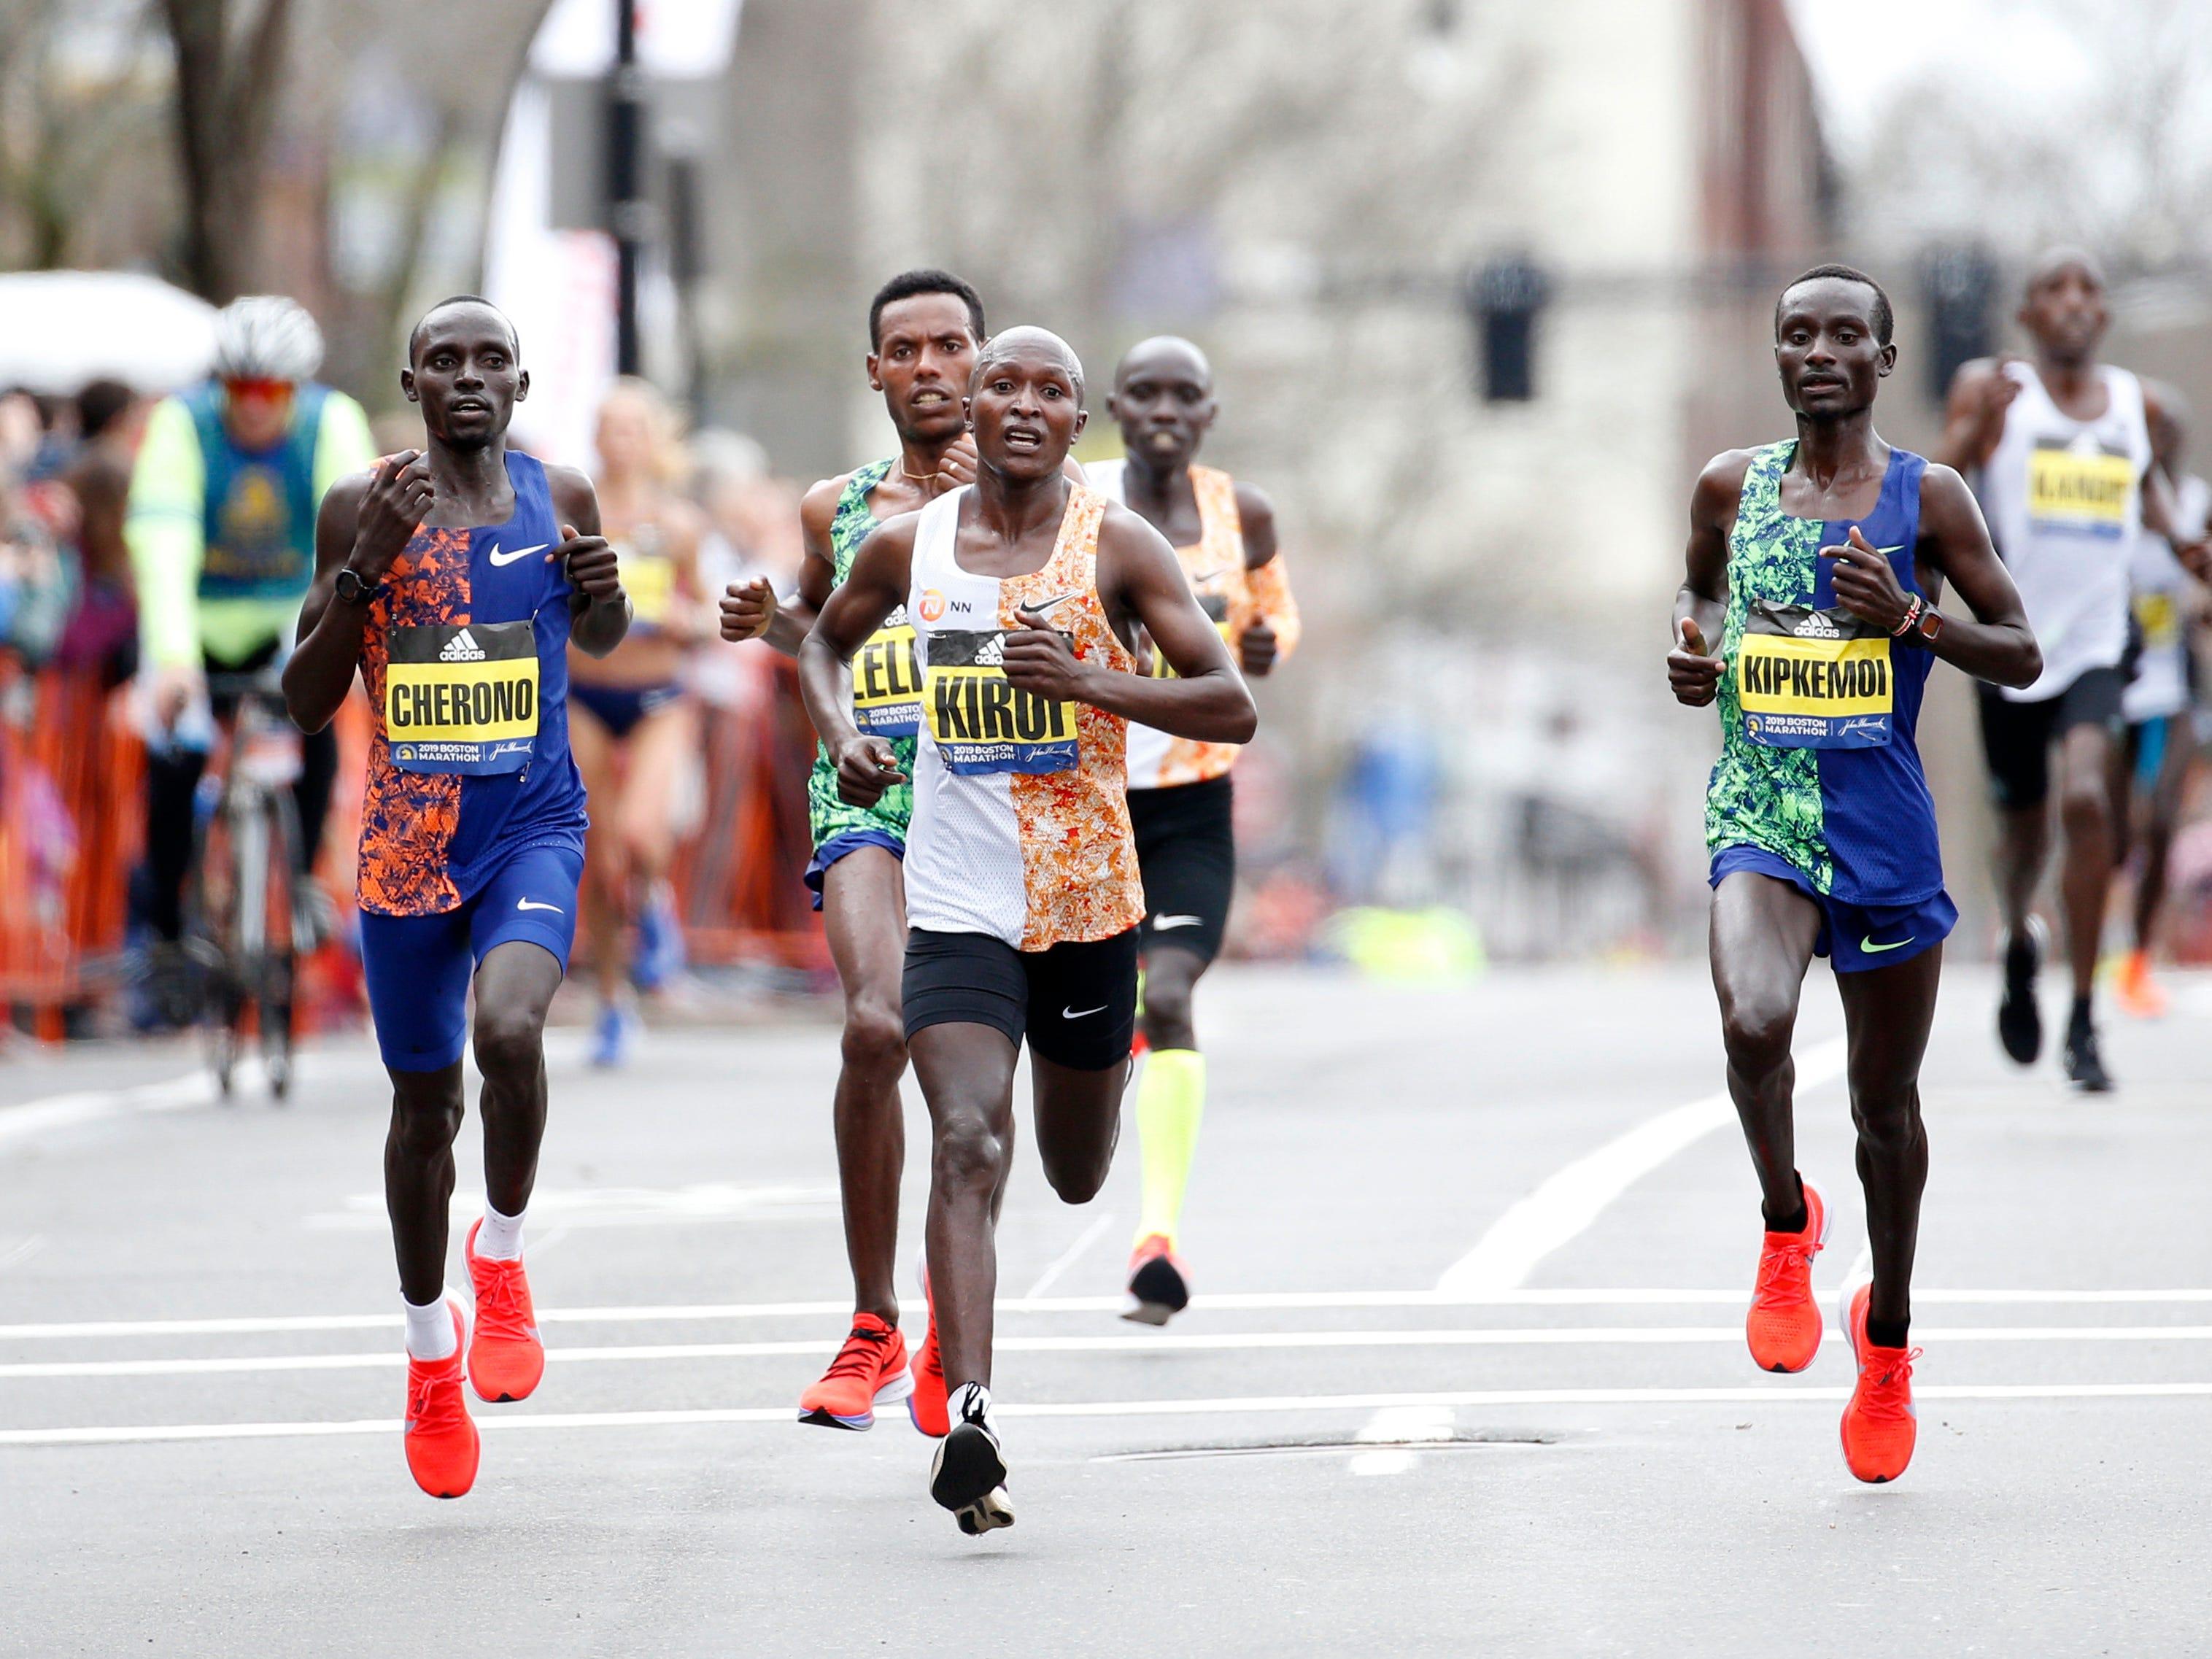 Geoffrey Kirui leads at mile 24 during the 2019 Boston Marathon.